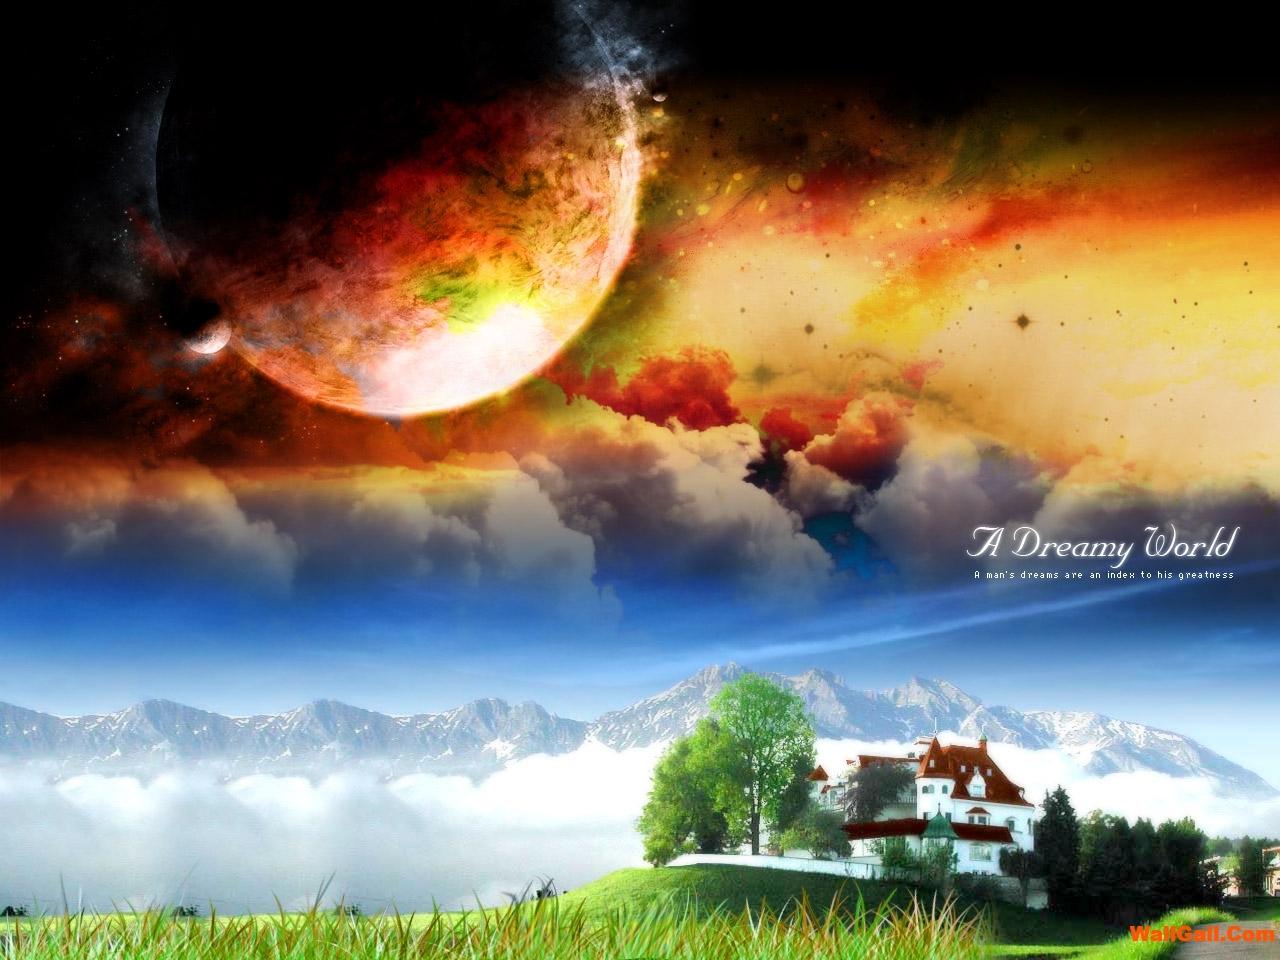 http://4.bp.blogspot.com/-1NZzG-lBeew/ThsZ0Fj7Z0I/AAAAAAAAH68/QGawJsl91qo/s1600/Fantasy+Wallpapers+hd.jpg